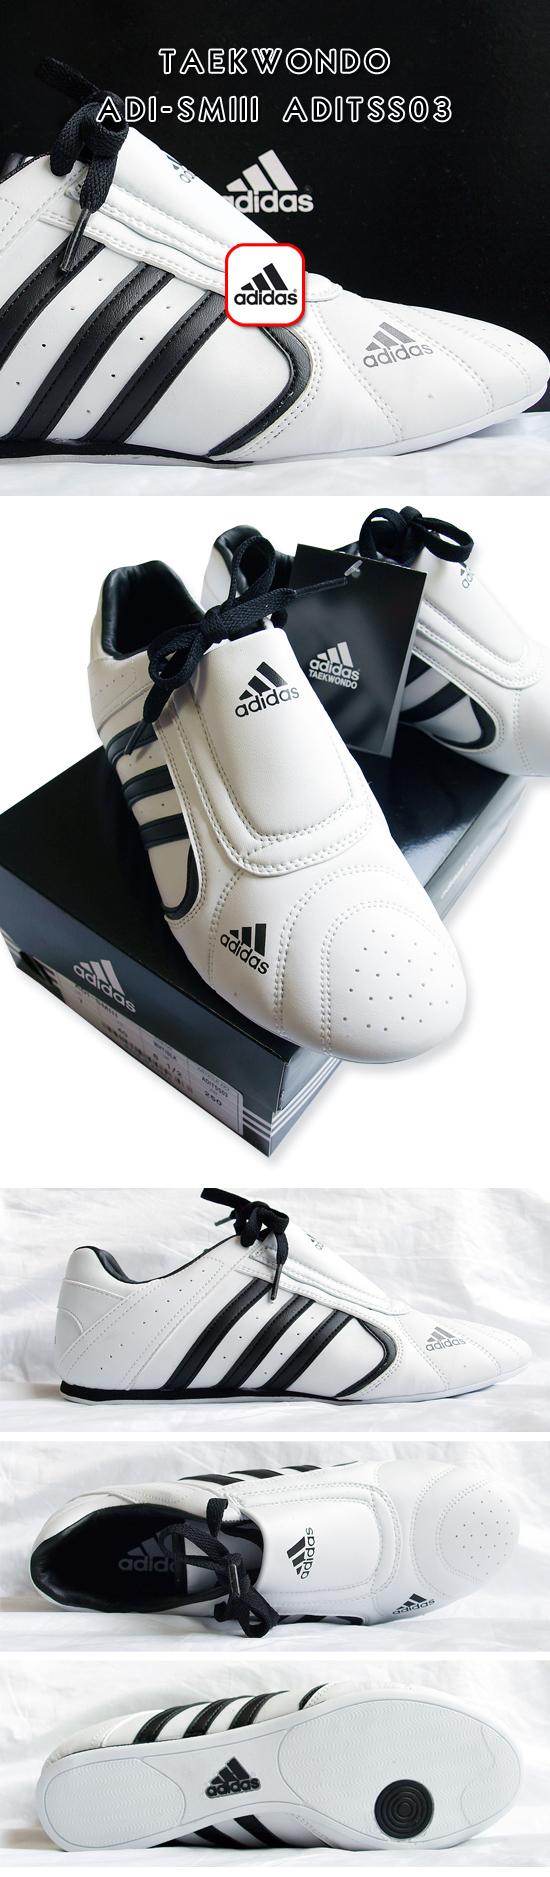 Adidas dga sm3 aditss03 taekwondo scarpe tkd ebay